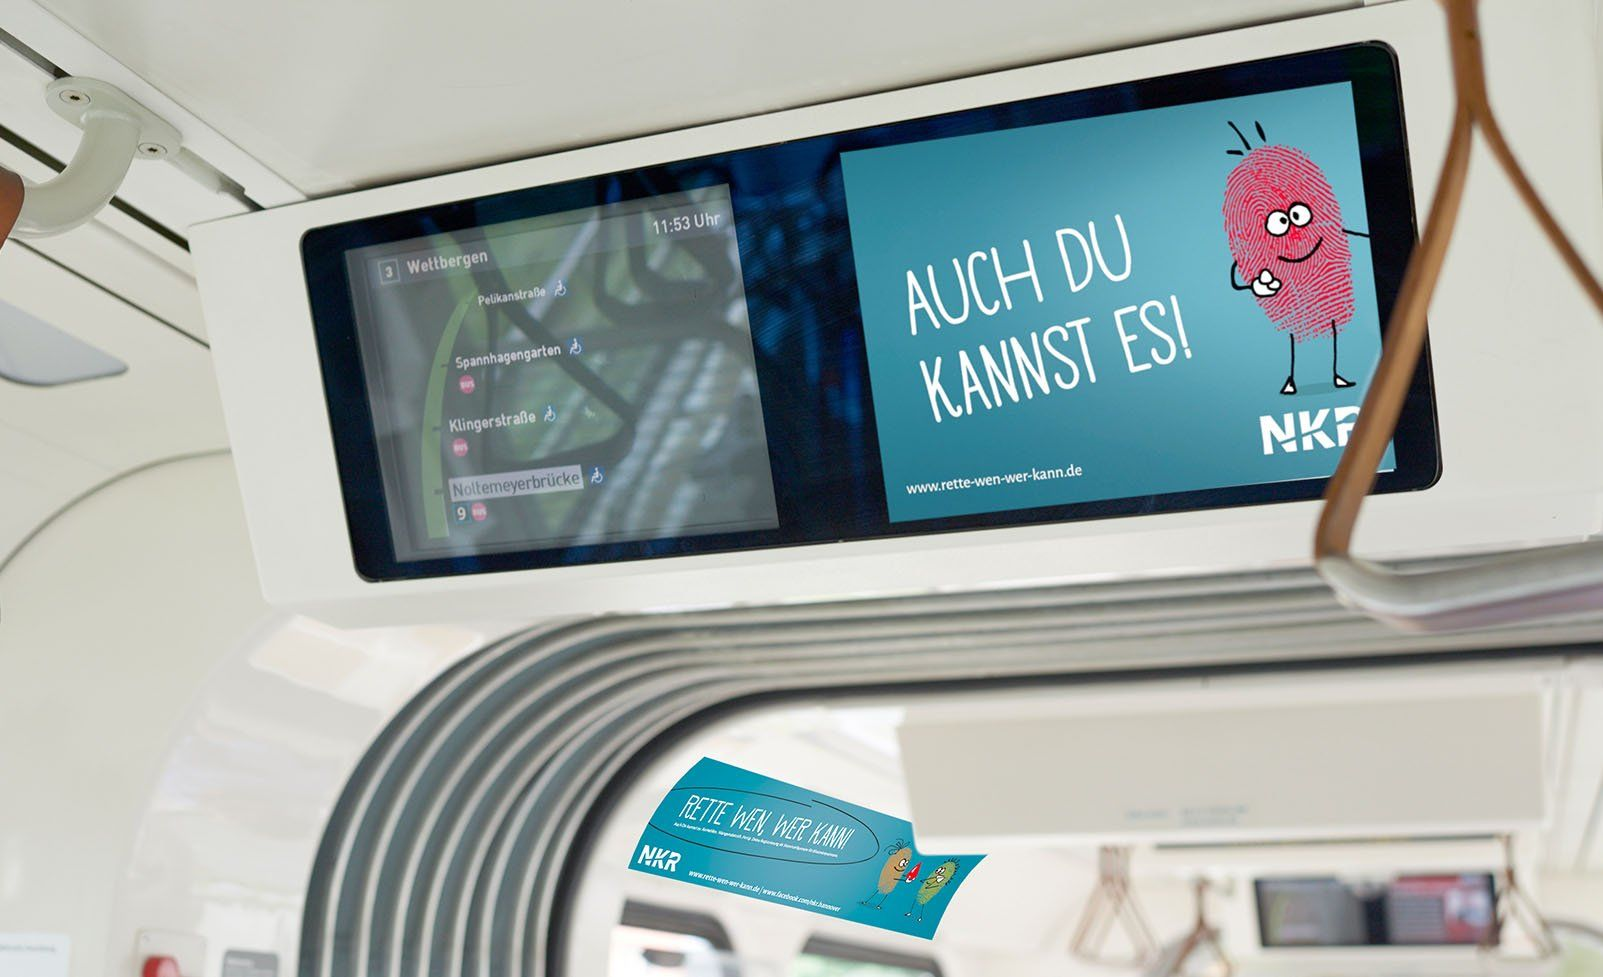 "Fahrgastfernsehen NKR Kampagne ""Rette wen, wer kann!"""